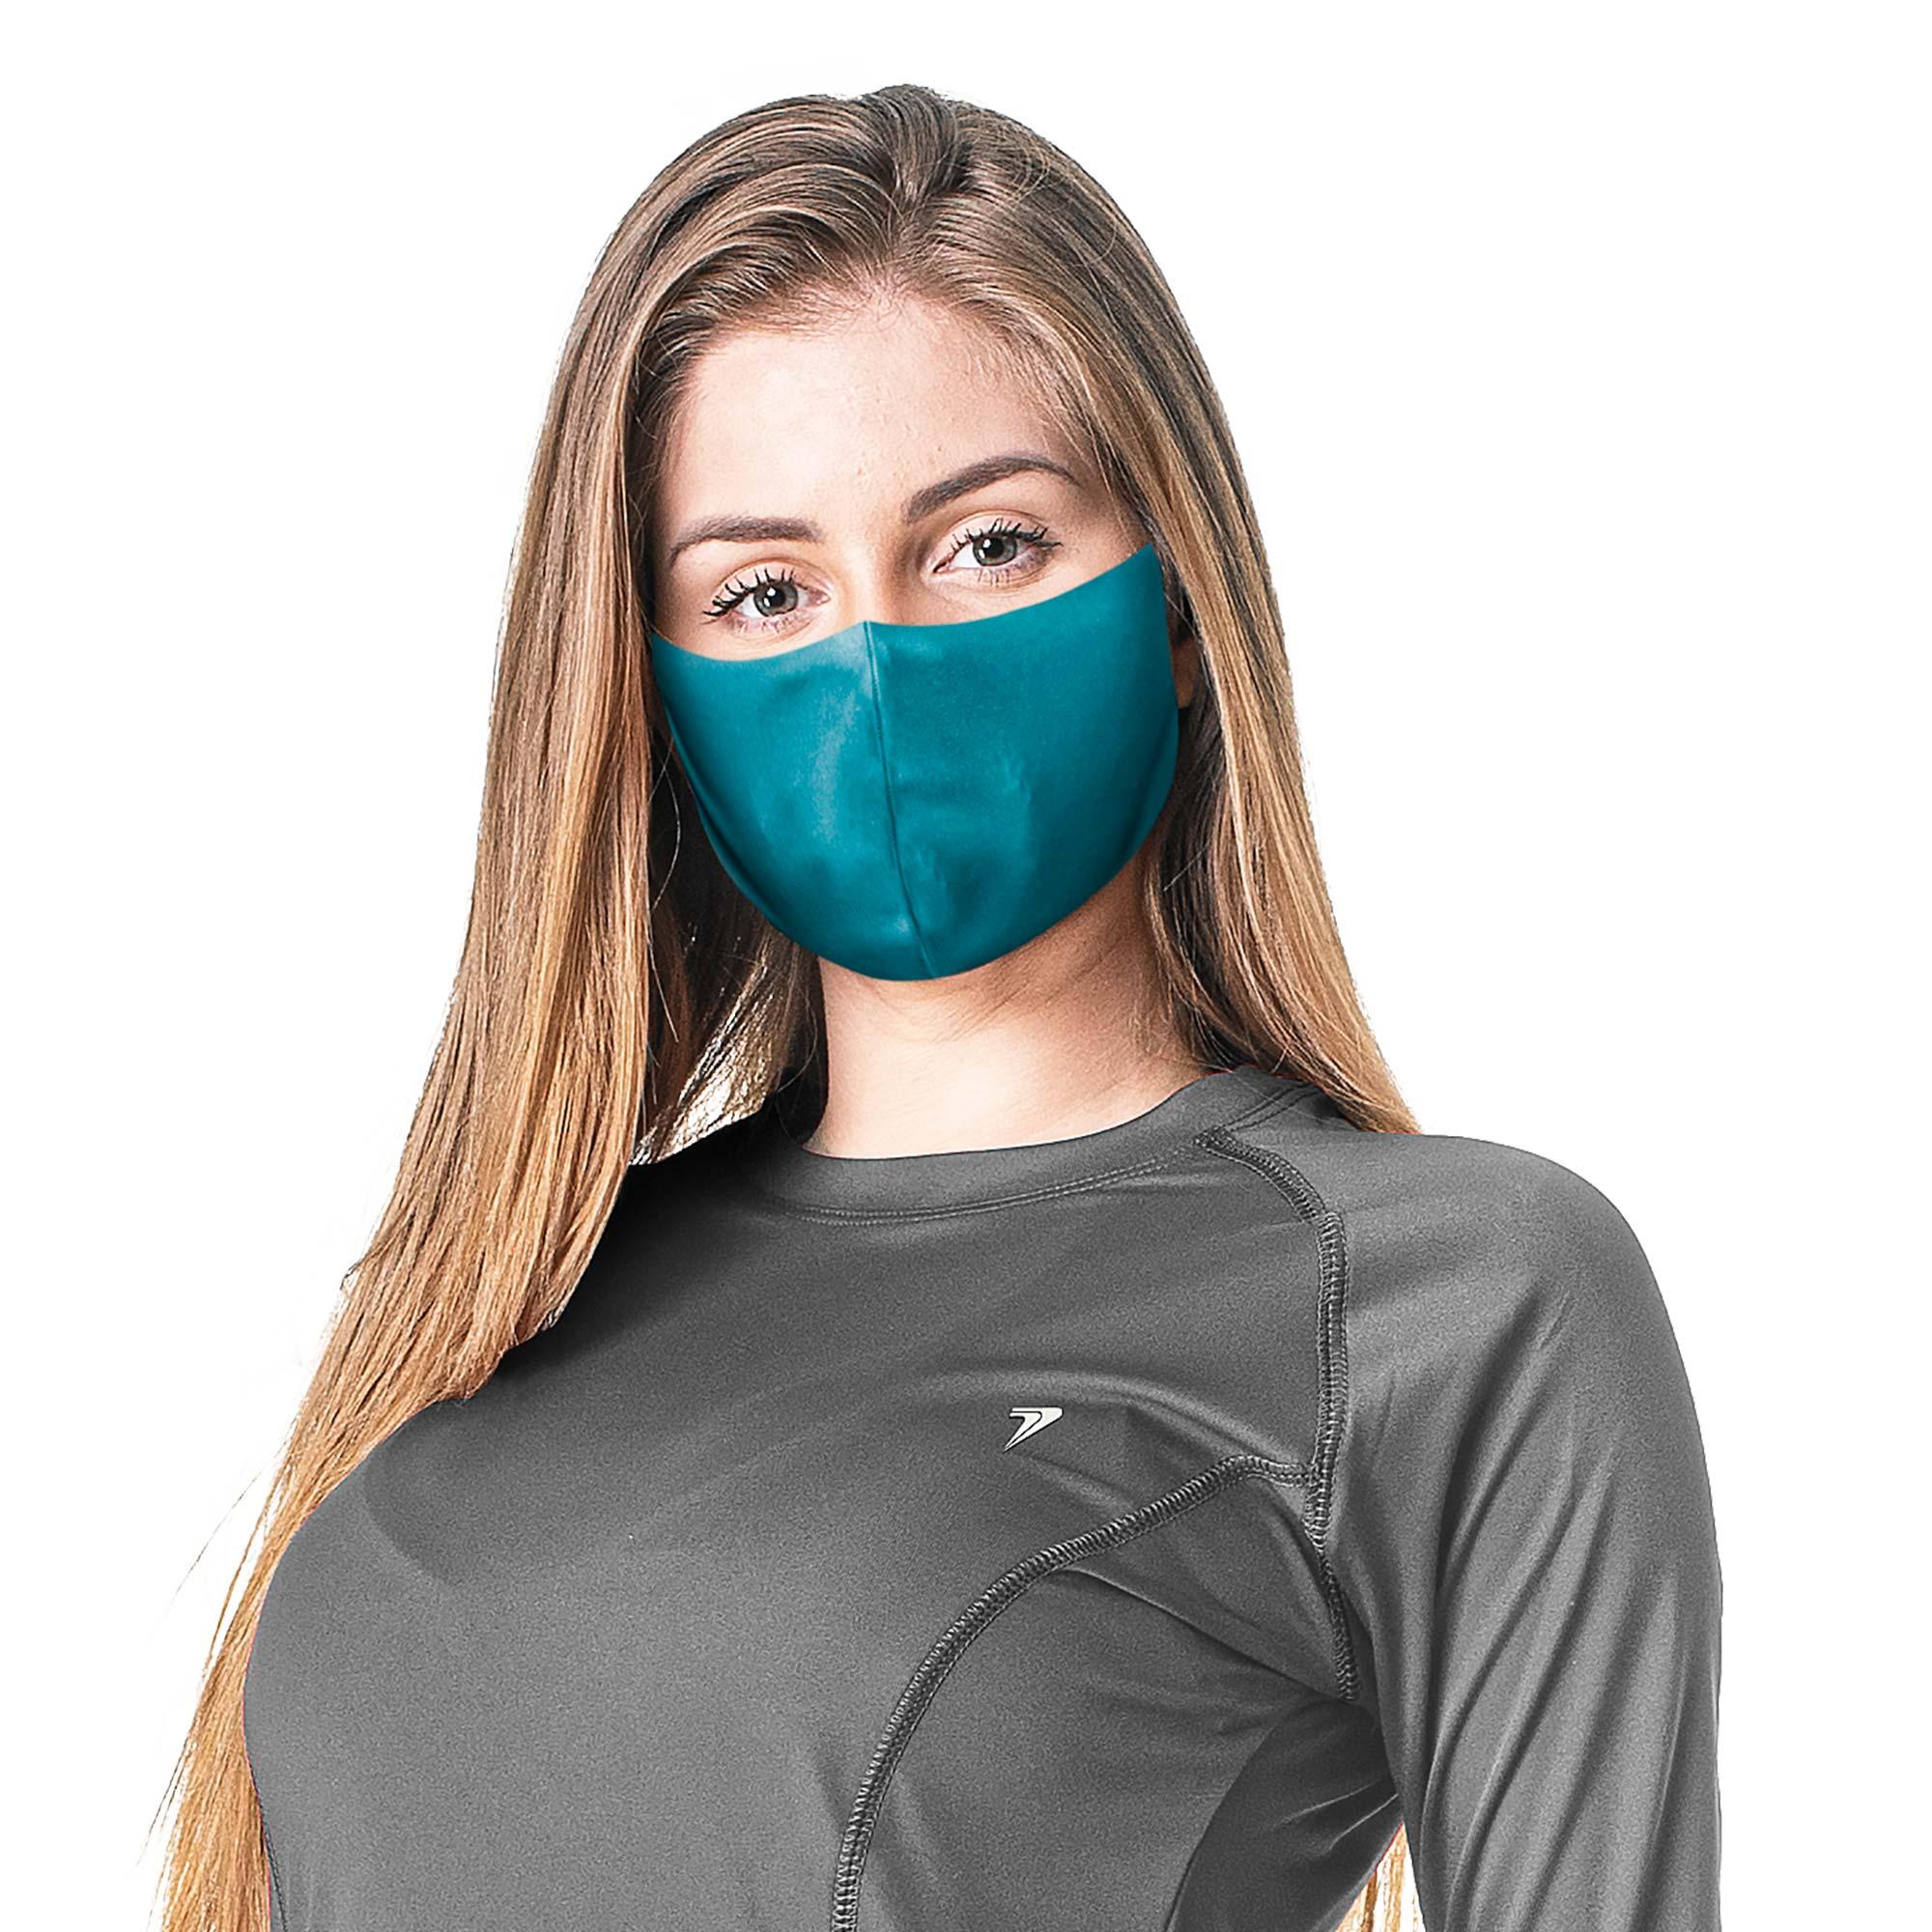 Calção BIG SIZE + Máscara Multiesportiva ANTIVIRAL